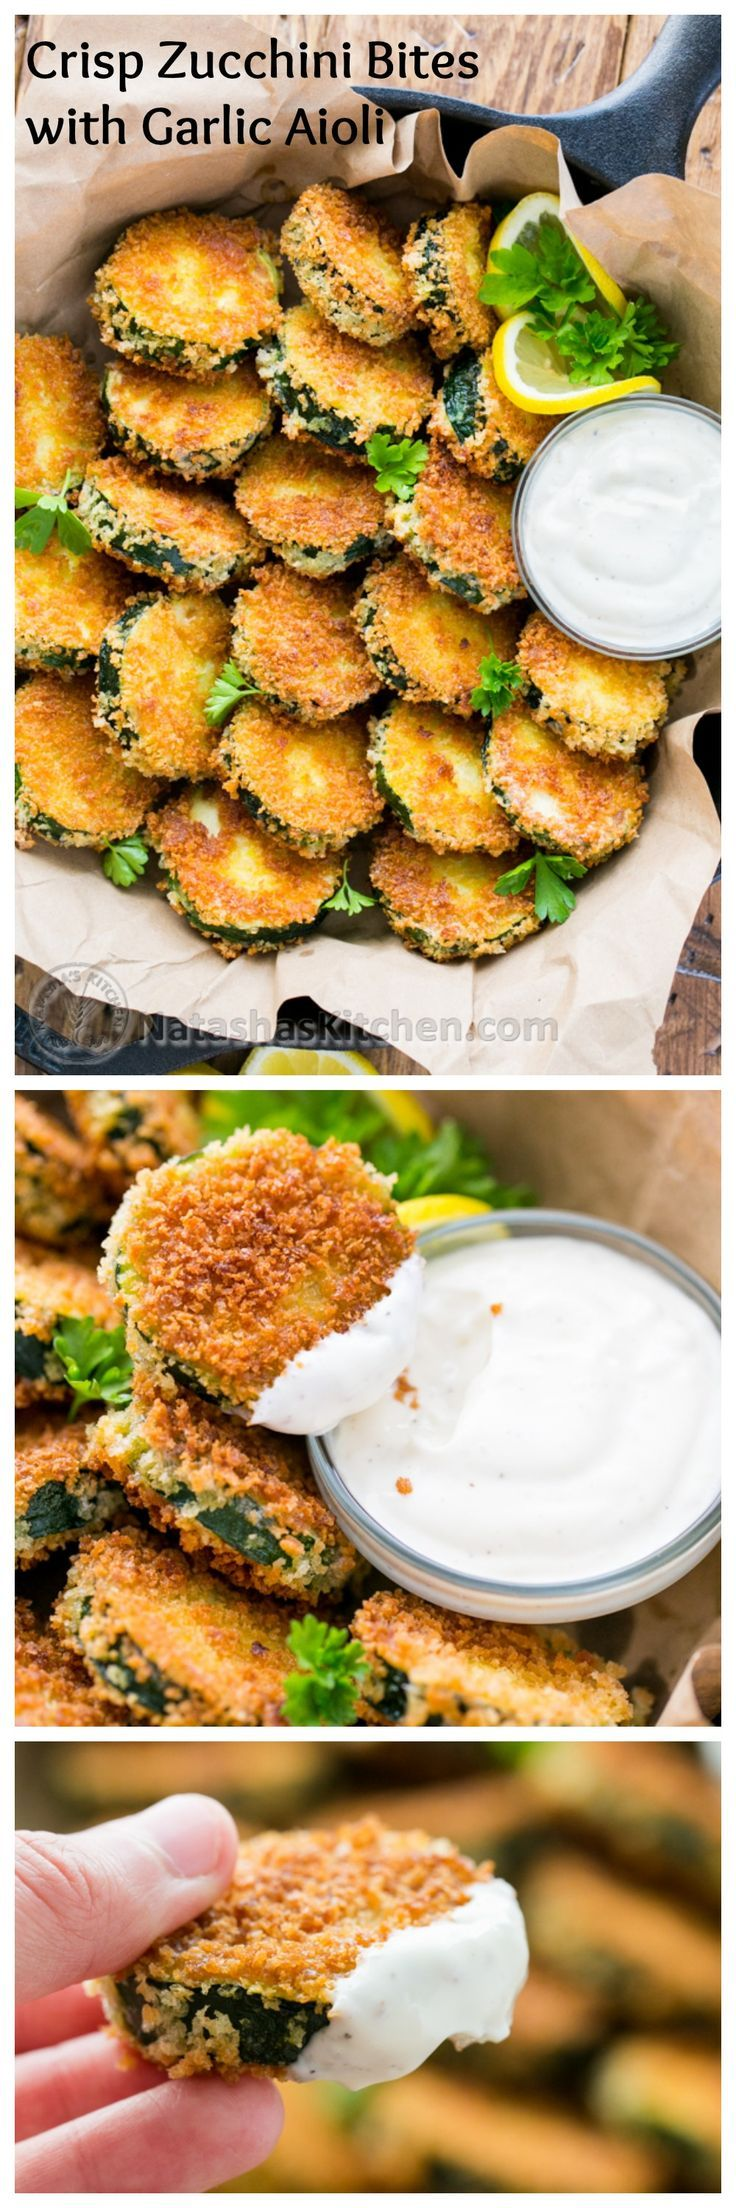 Crisp Zucchini Bites with Garlic Aioli Dip | Crunchy and Savory | Great Holiday Appetizer @natashaskitchen